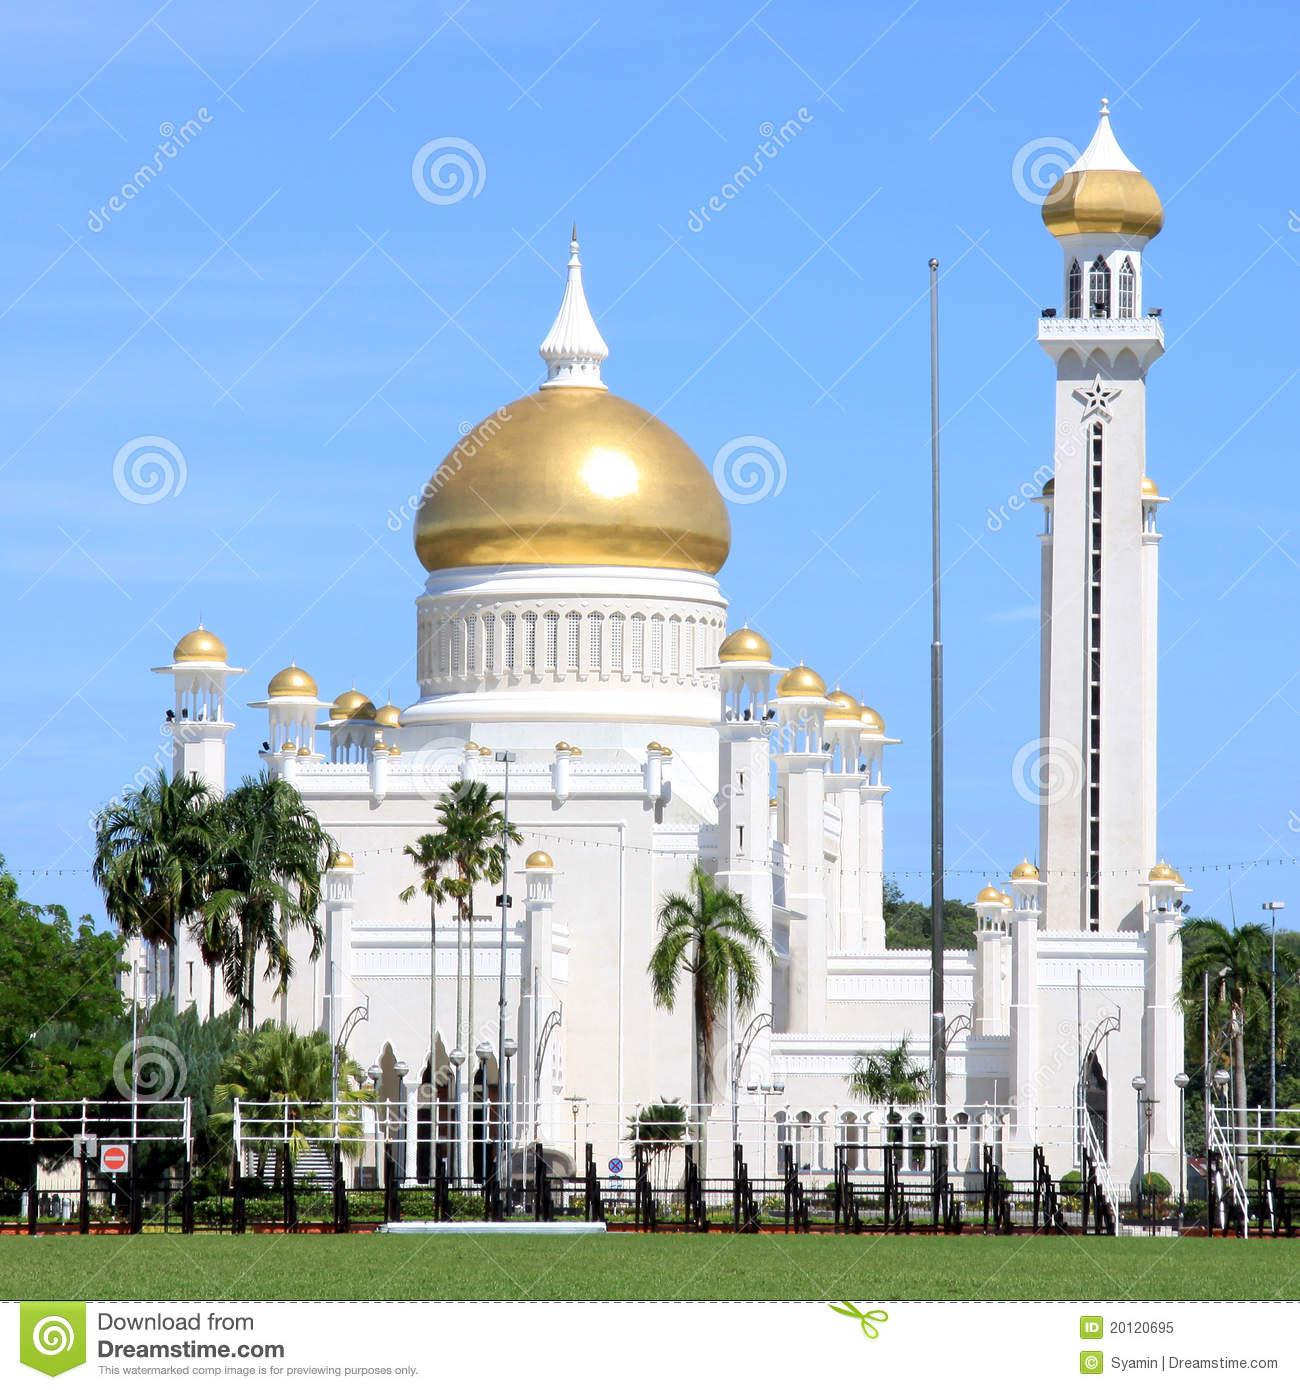 Sultan Omar Ali Saifuddin Mosque, Brunei Royalty Free Stock Photo.